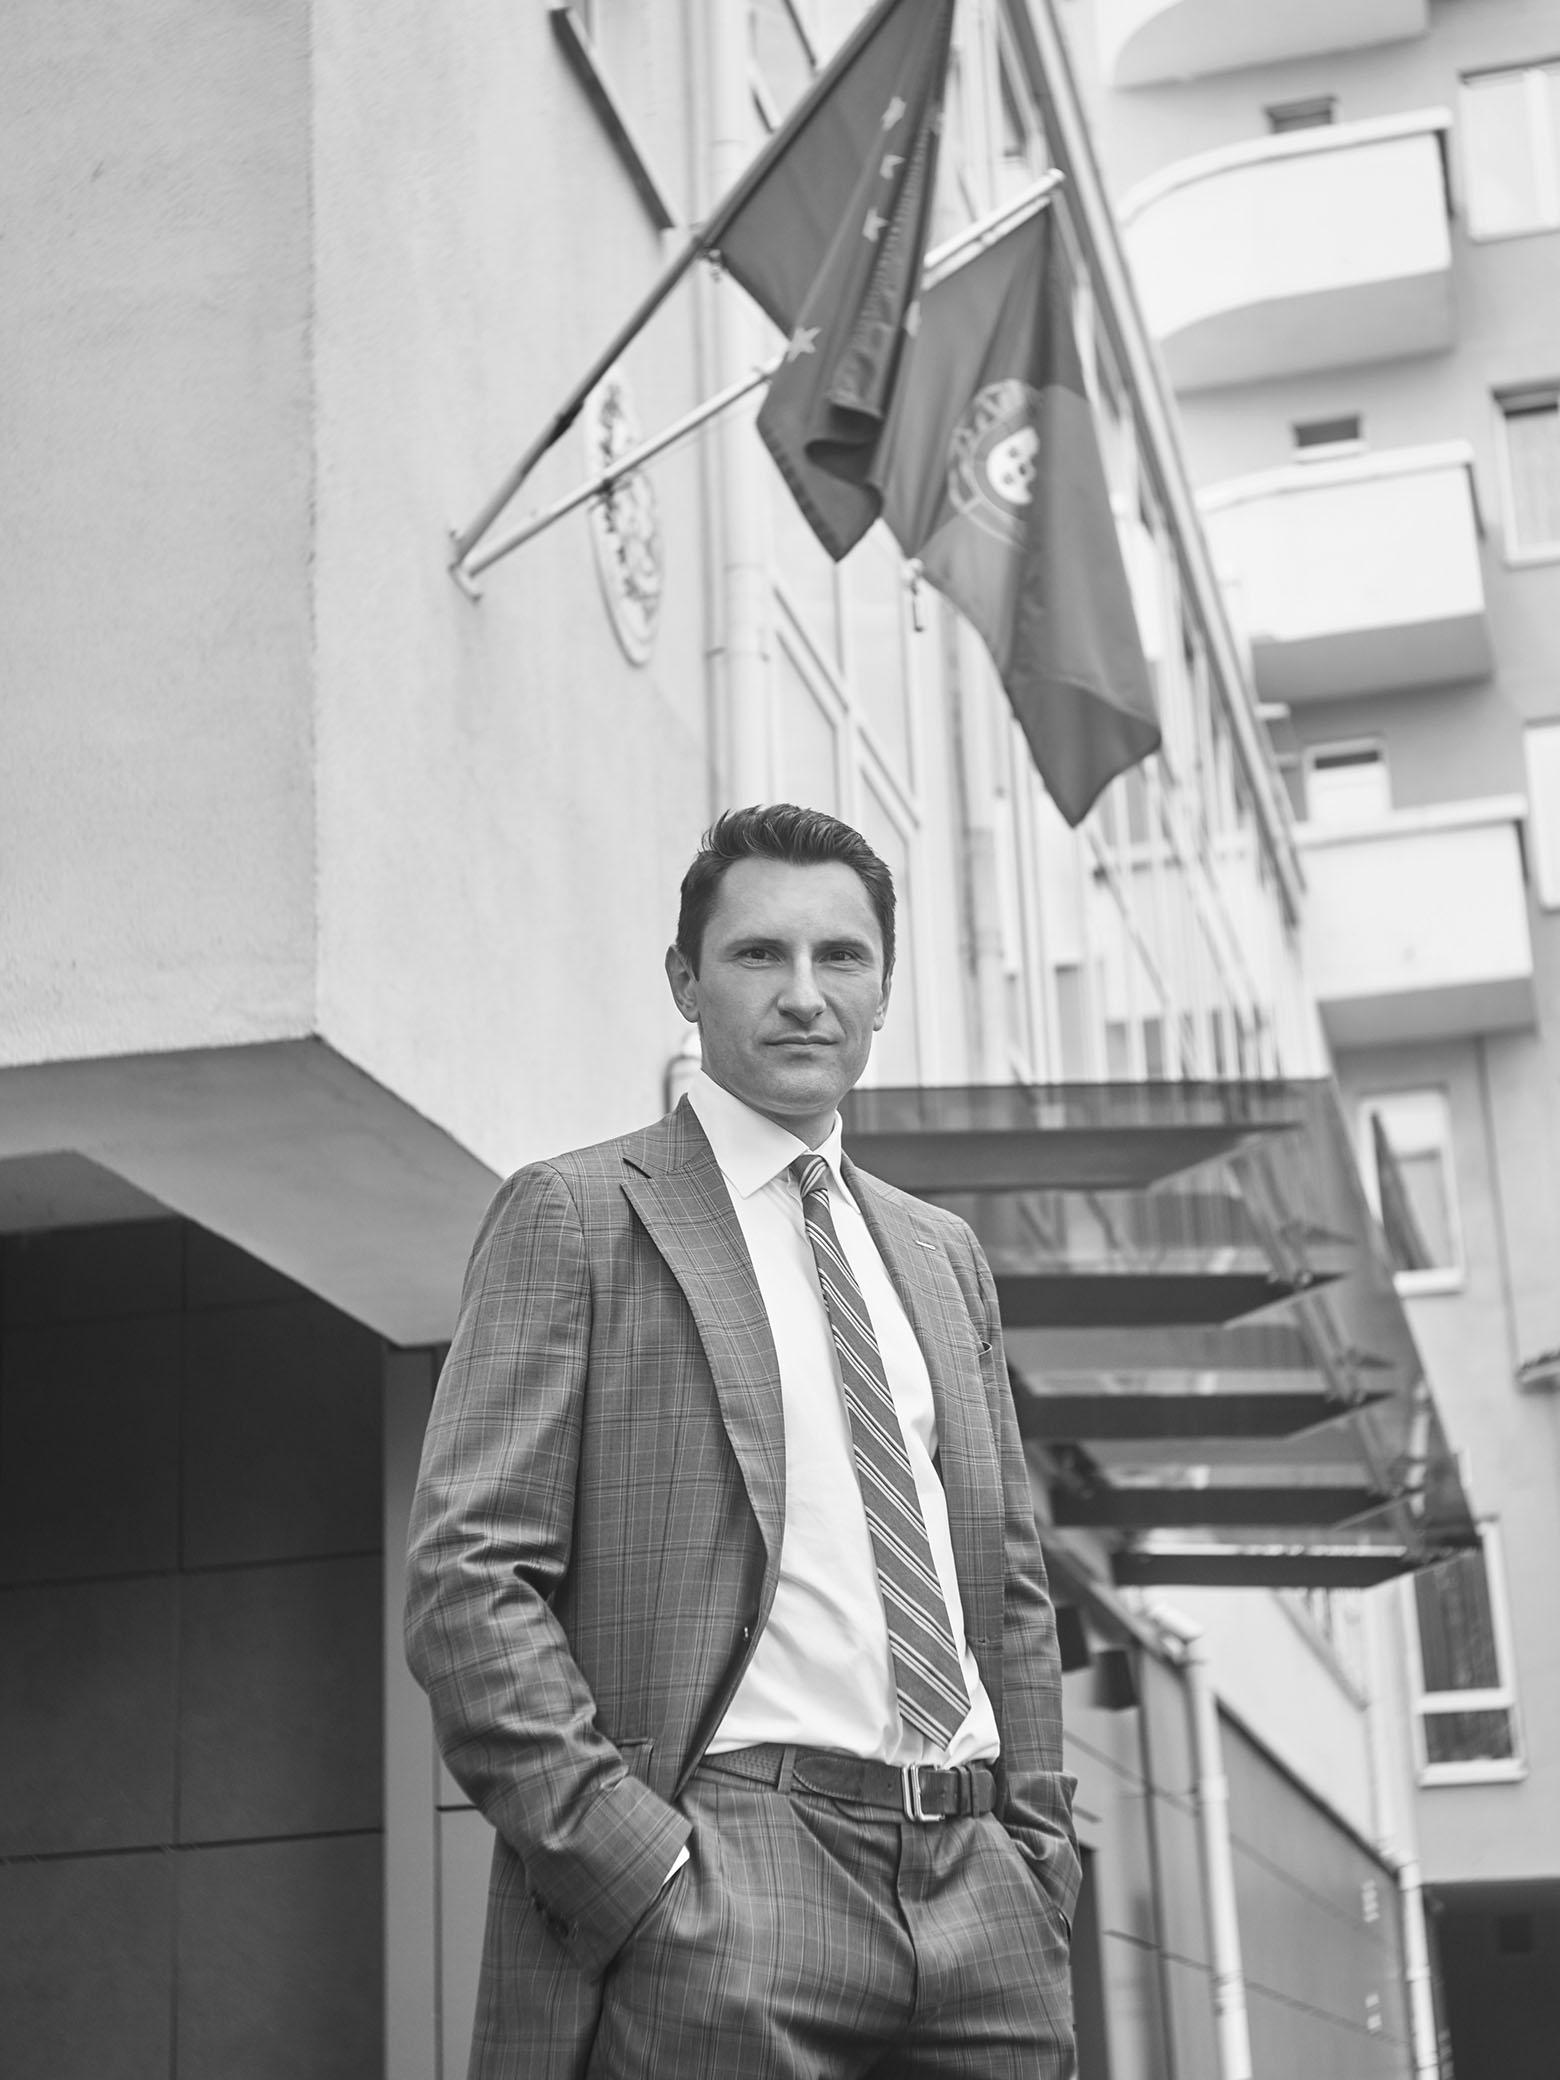 Основатель компании Streamline Эдуард Целюк